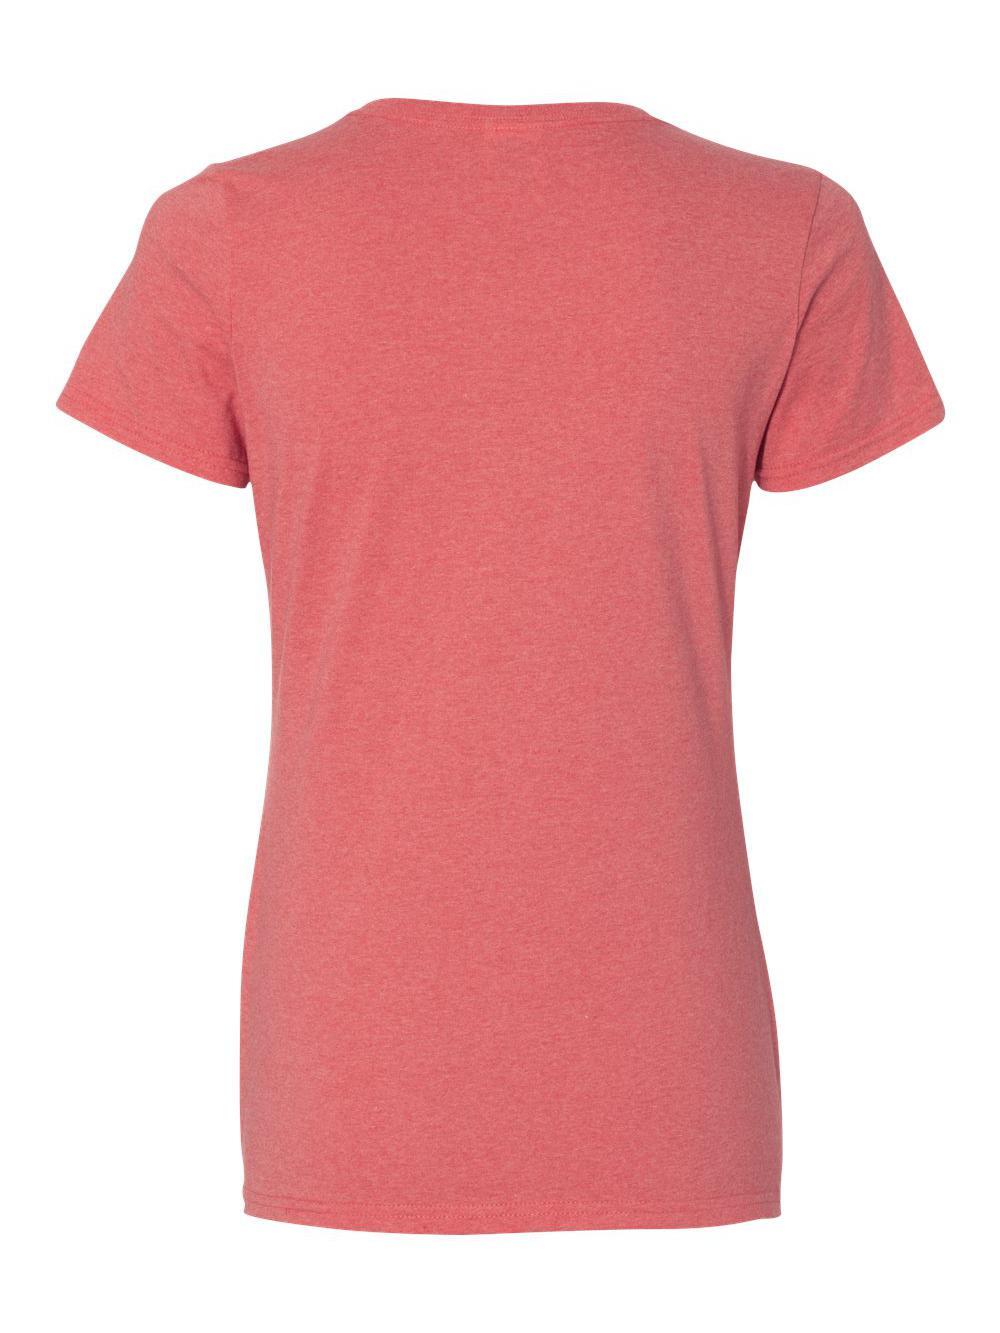 Fruit-of-the-Loom-HD-Cotton-Women-039-s-Short-Sleeve-T-Shirt-L3930R thumbnail 25